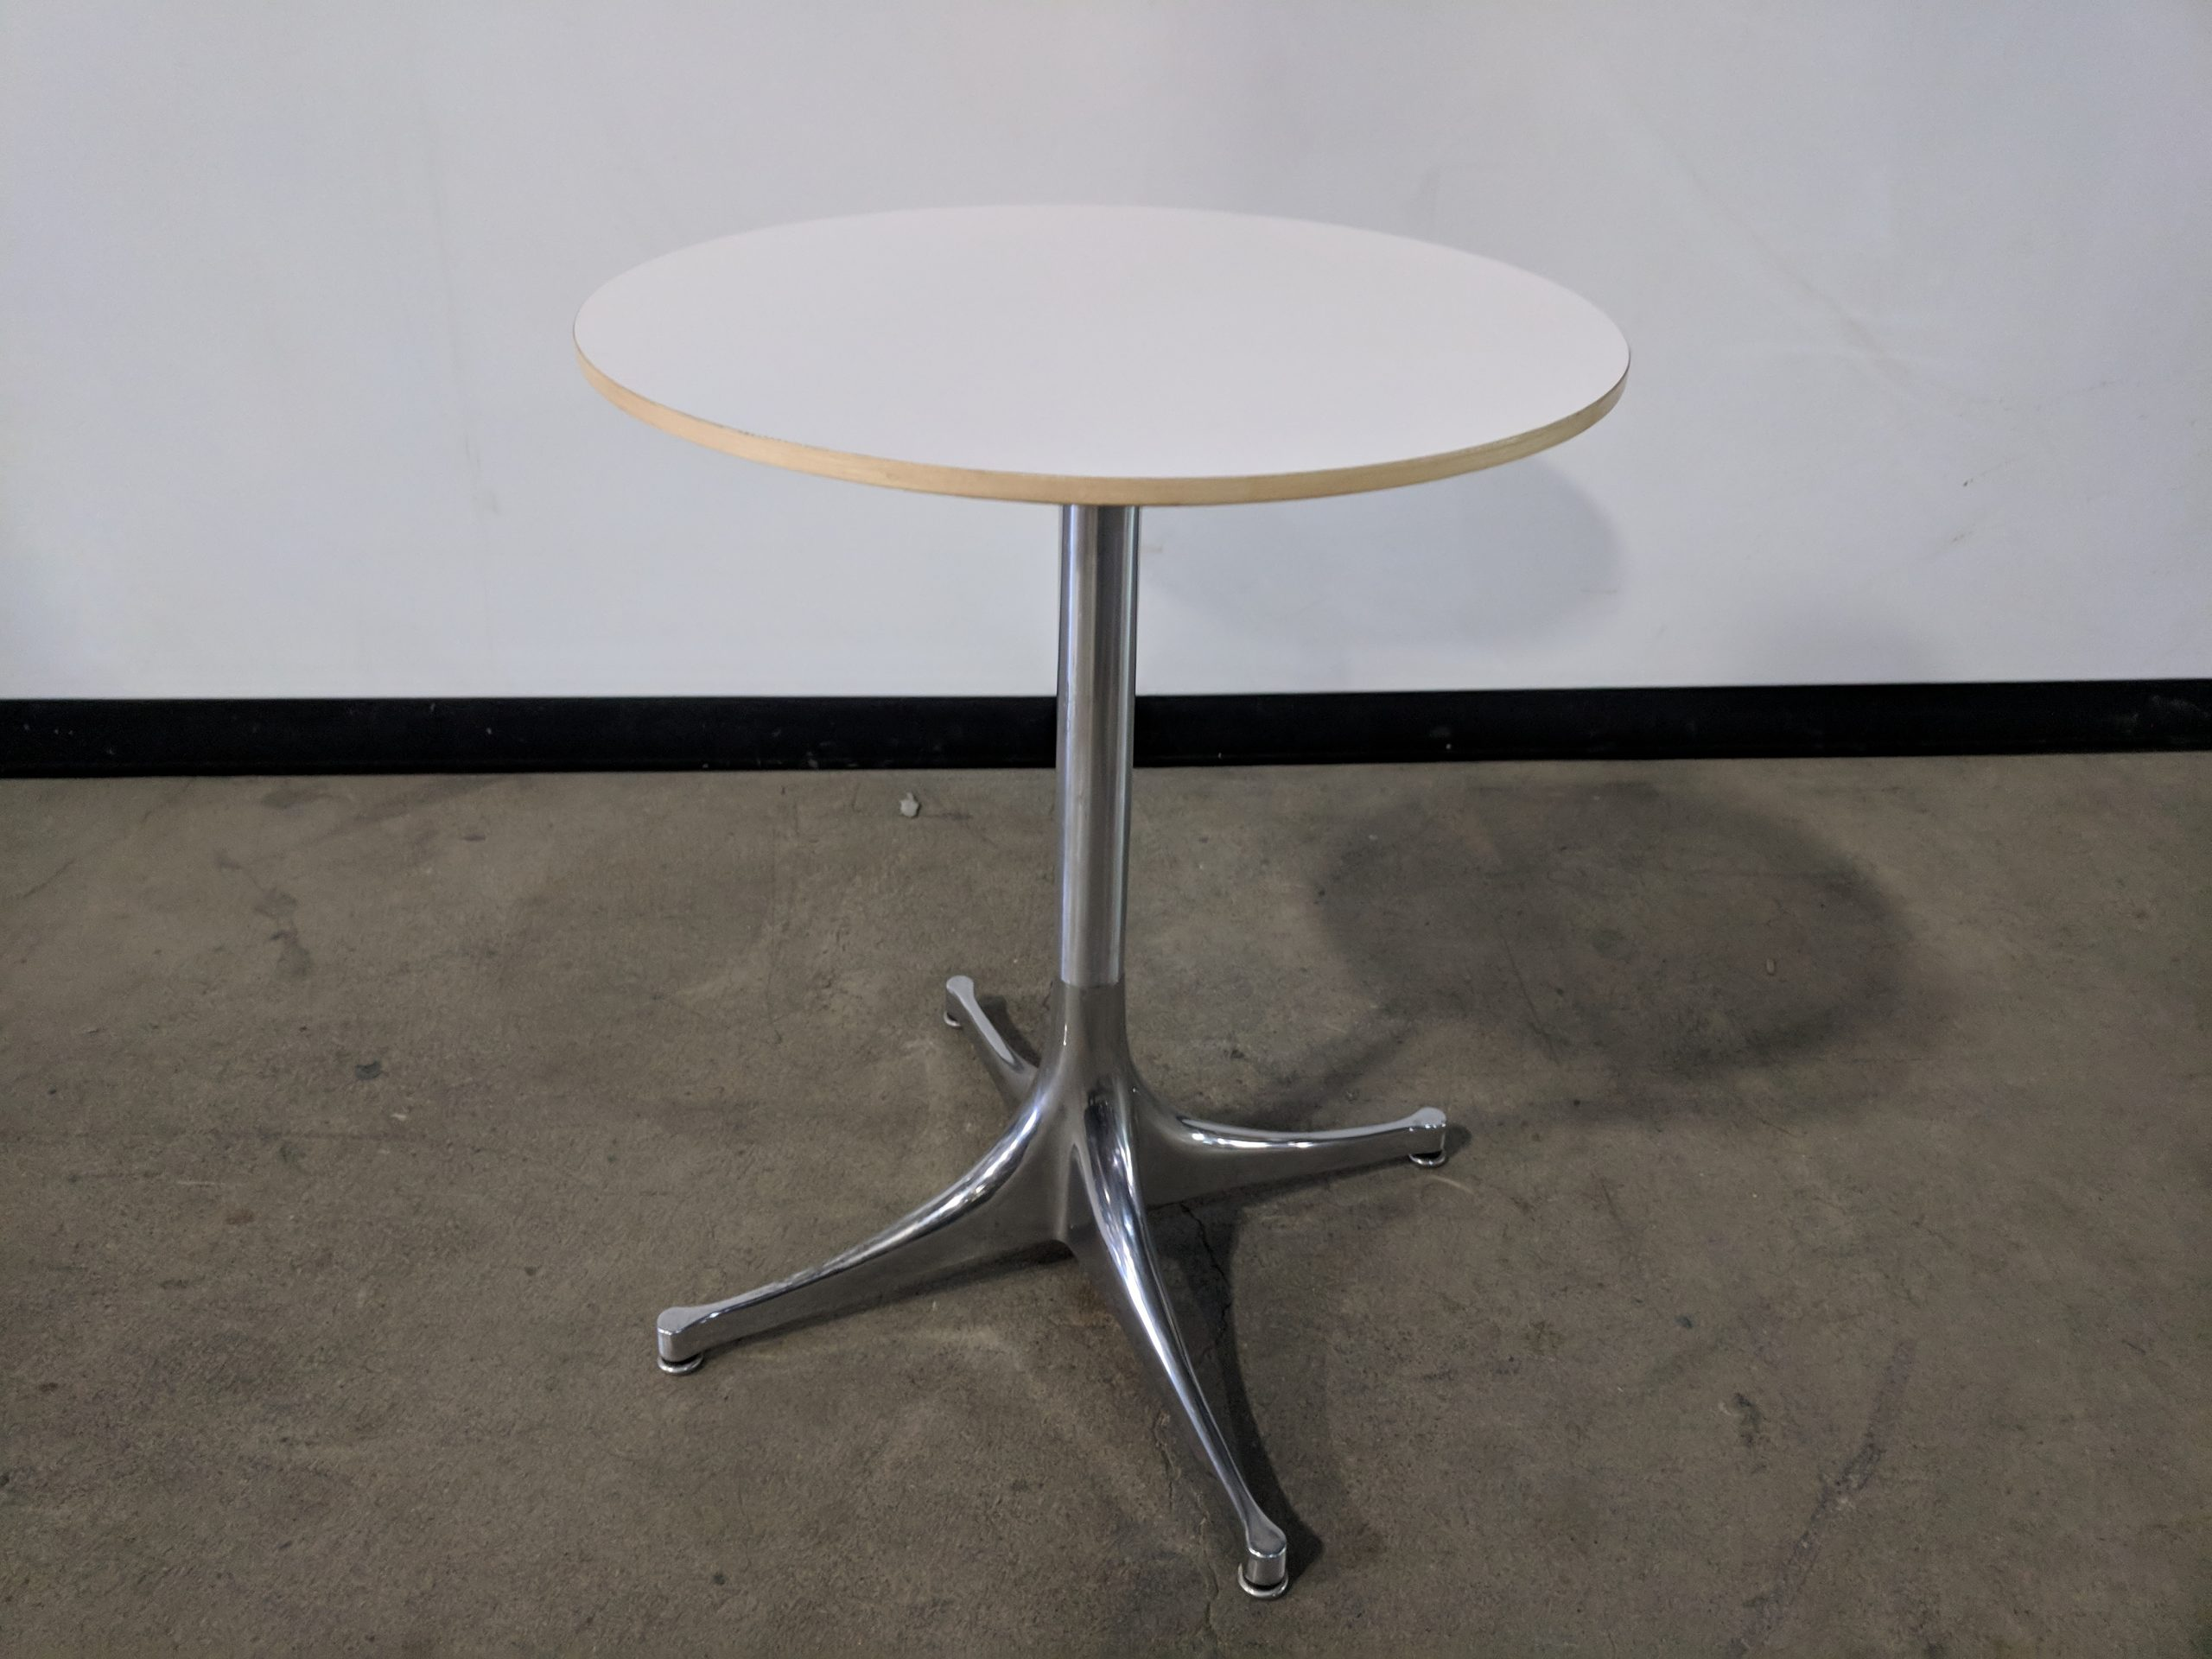 HERMAN MILLER SIDE TABLE ROUND